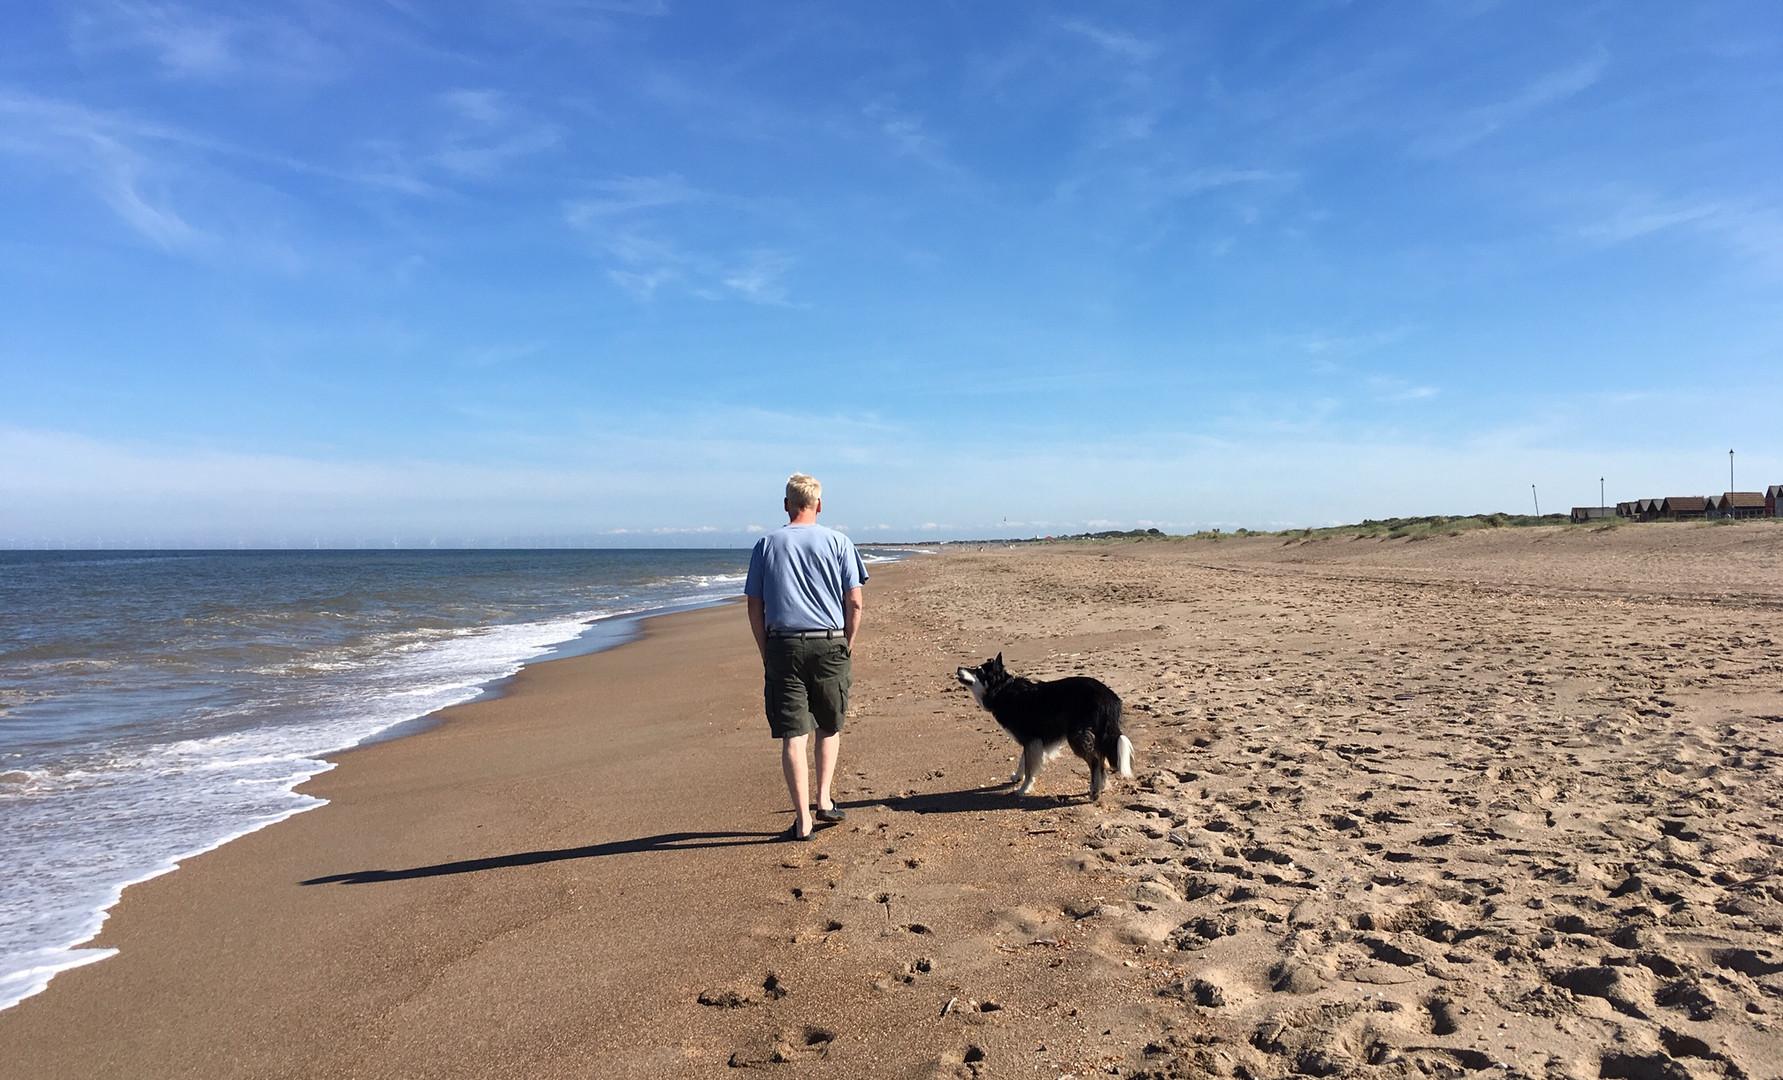 Sutton on Sea's sandy beach